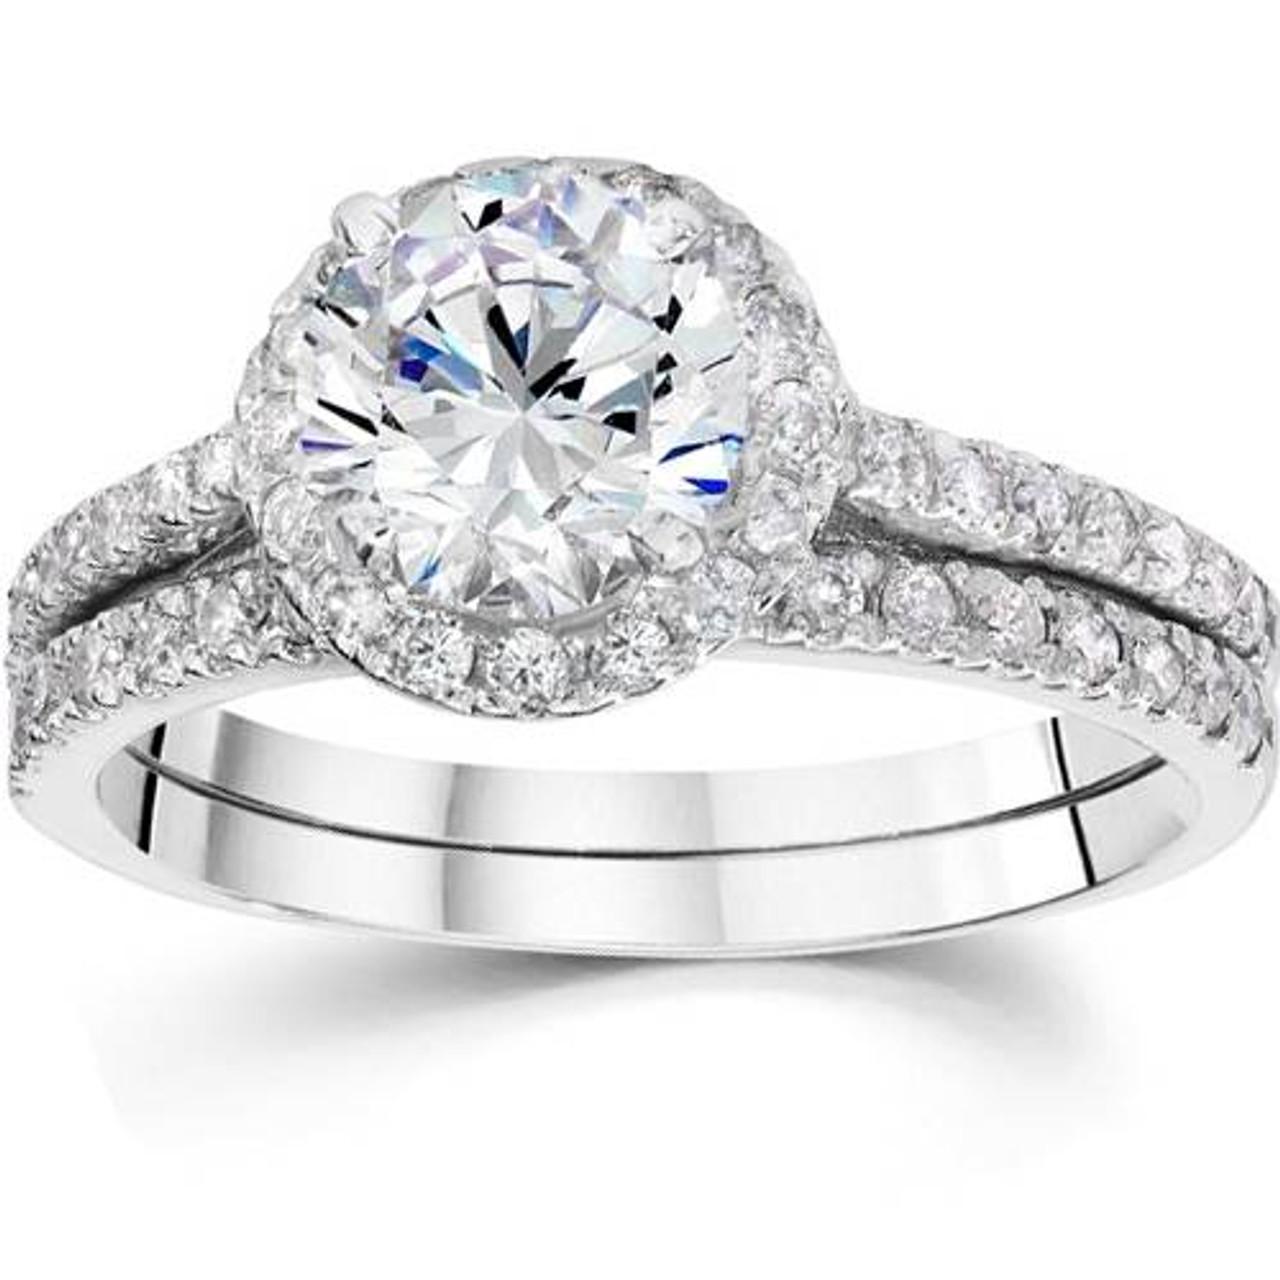 2 1 2 Carat Halo Round Enhanced Diamond Engagement Ring Matching Wedding Band Set